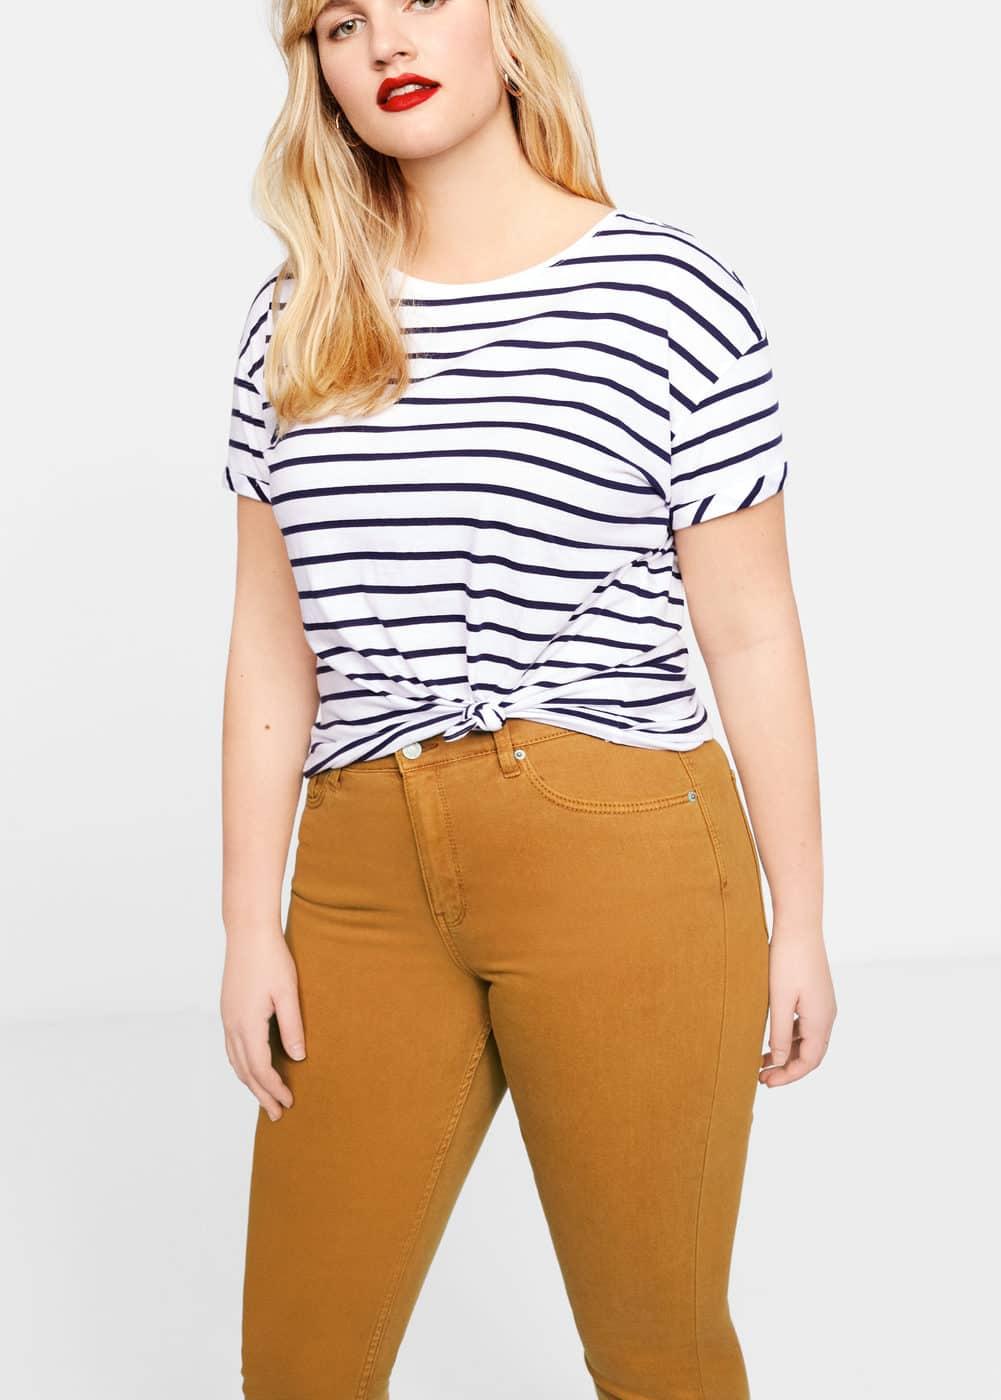 Mango - Slim Jeans Julia - 5